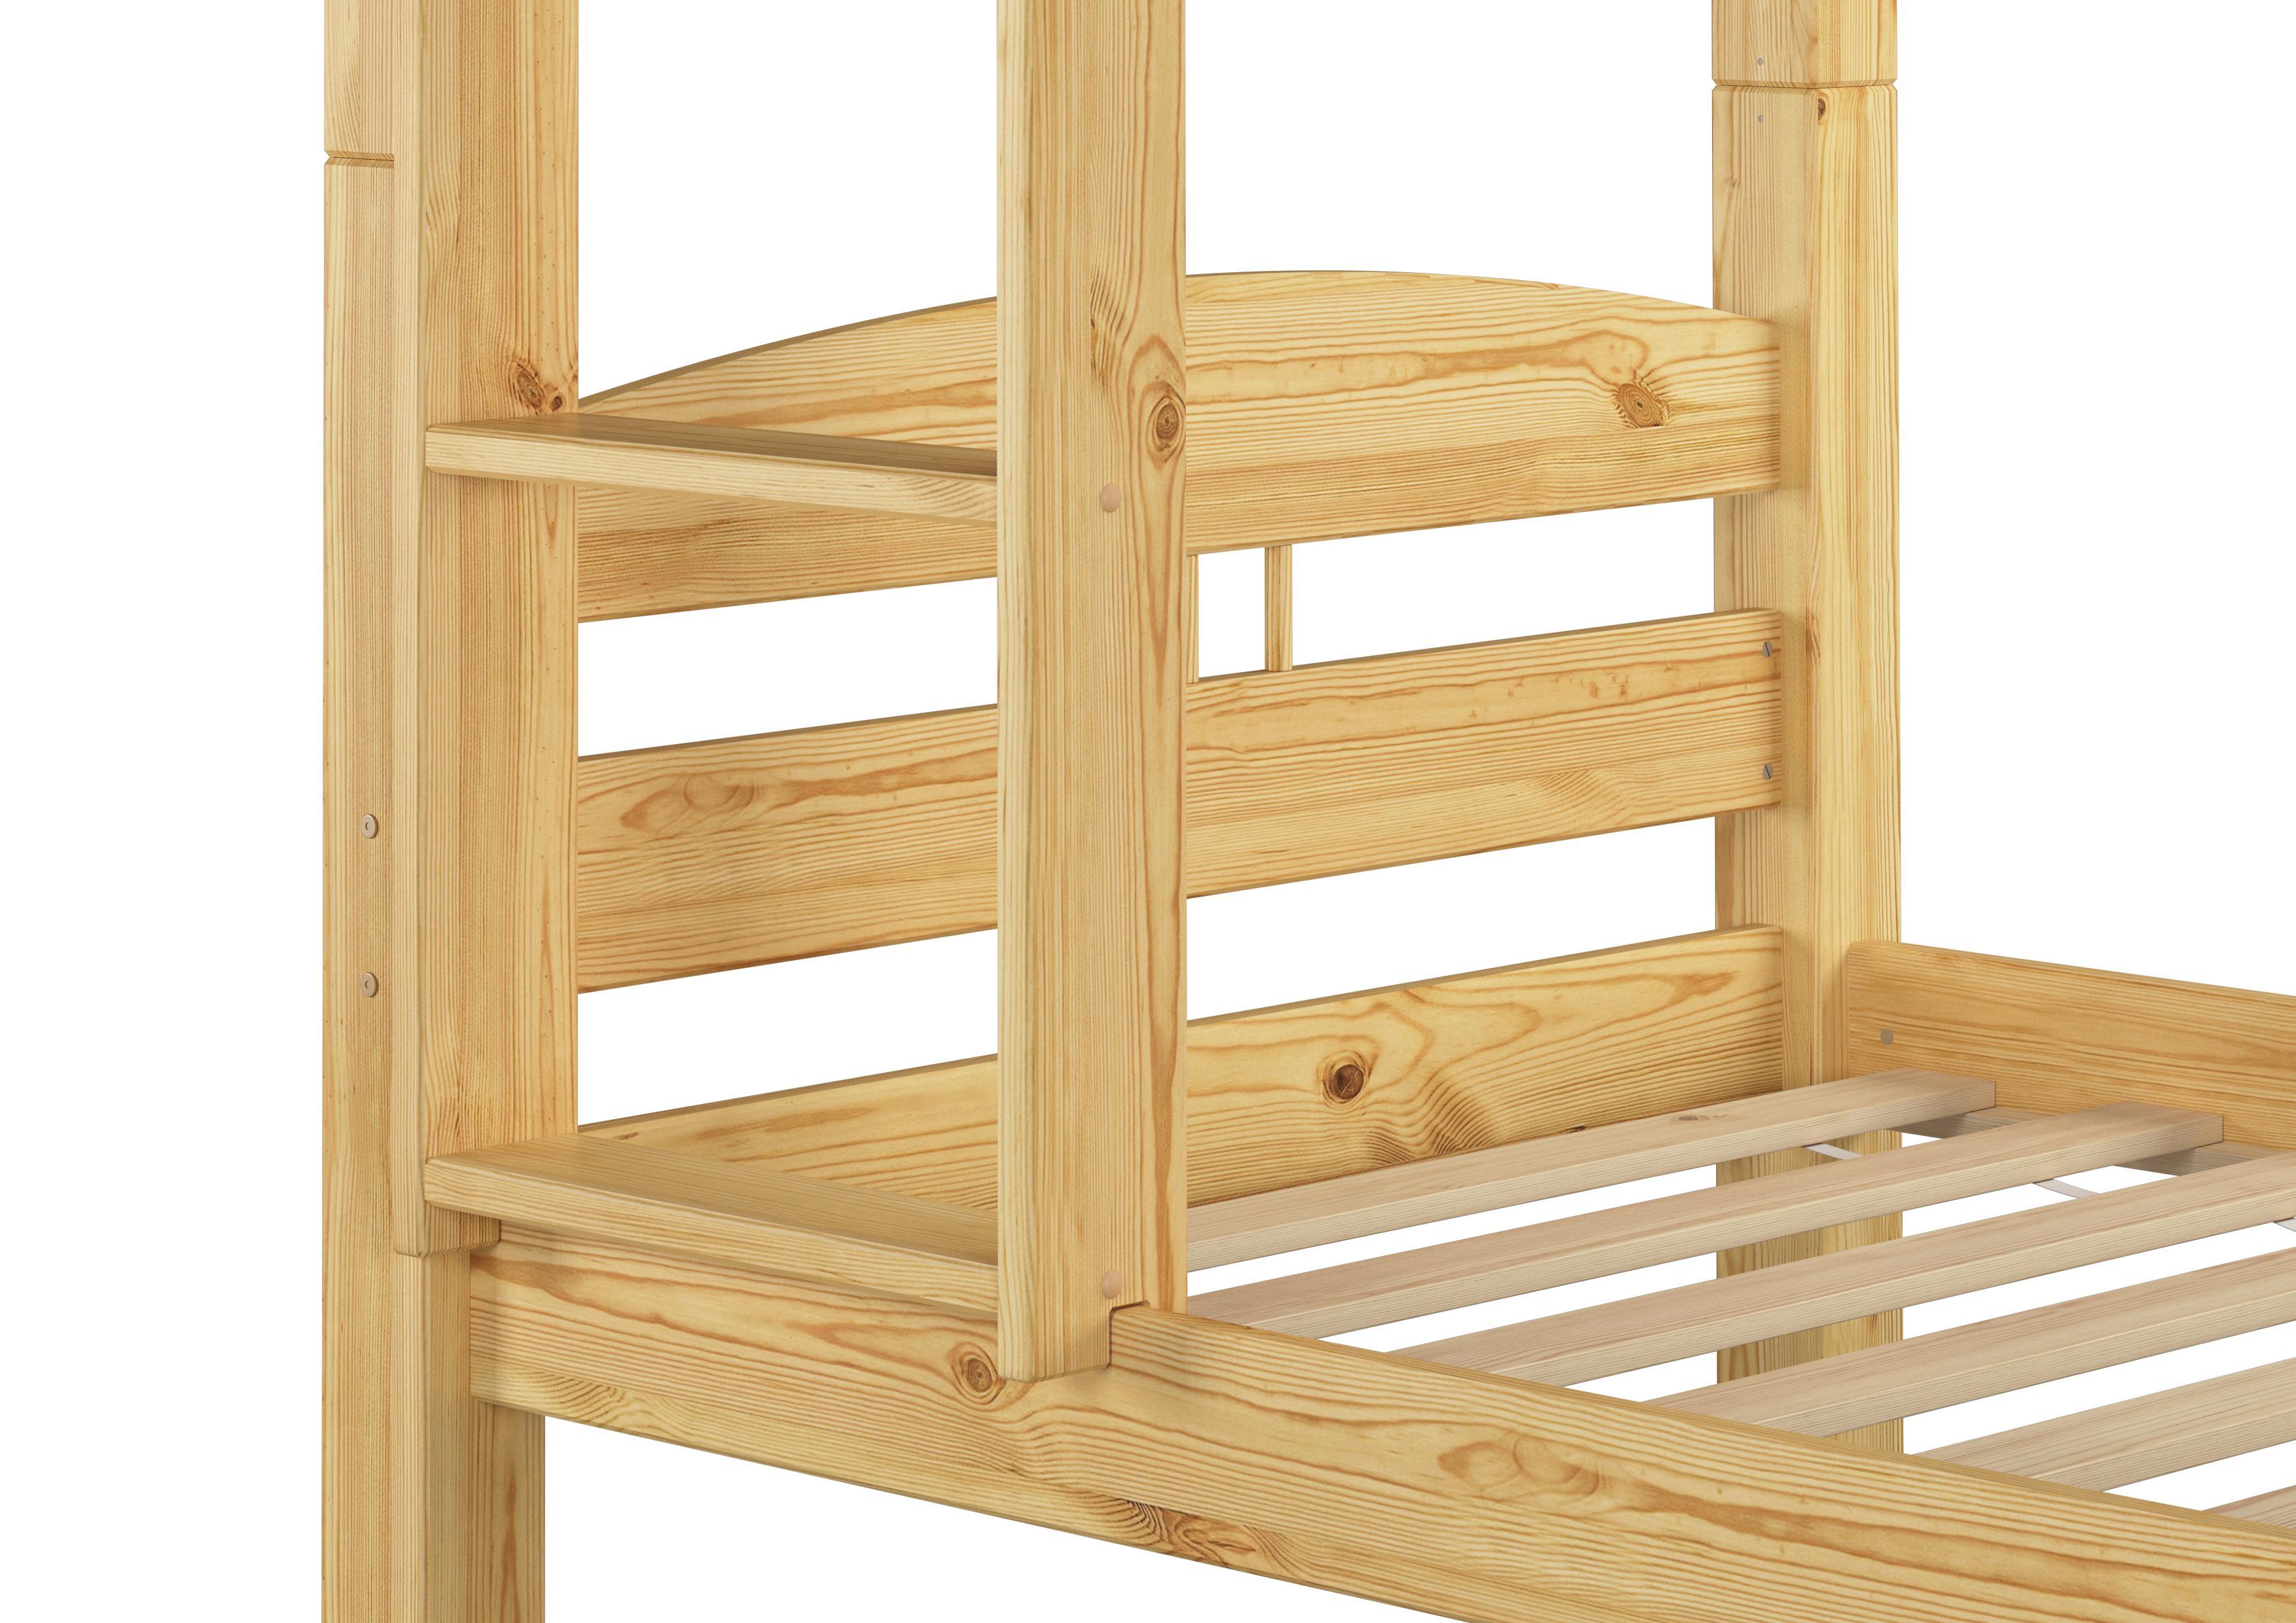 Erst-Holz® Stockbett Etagenbett Kiefer 90x200 massives